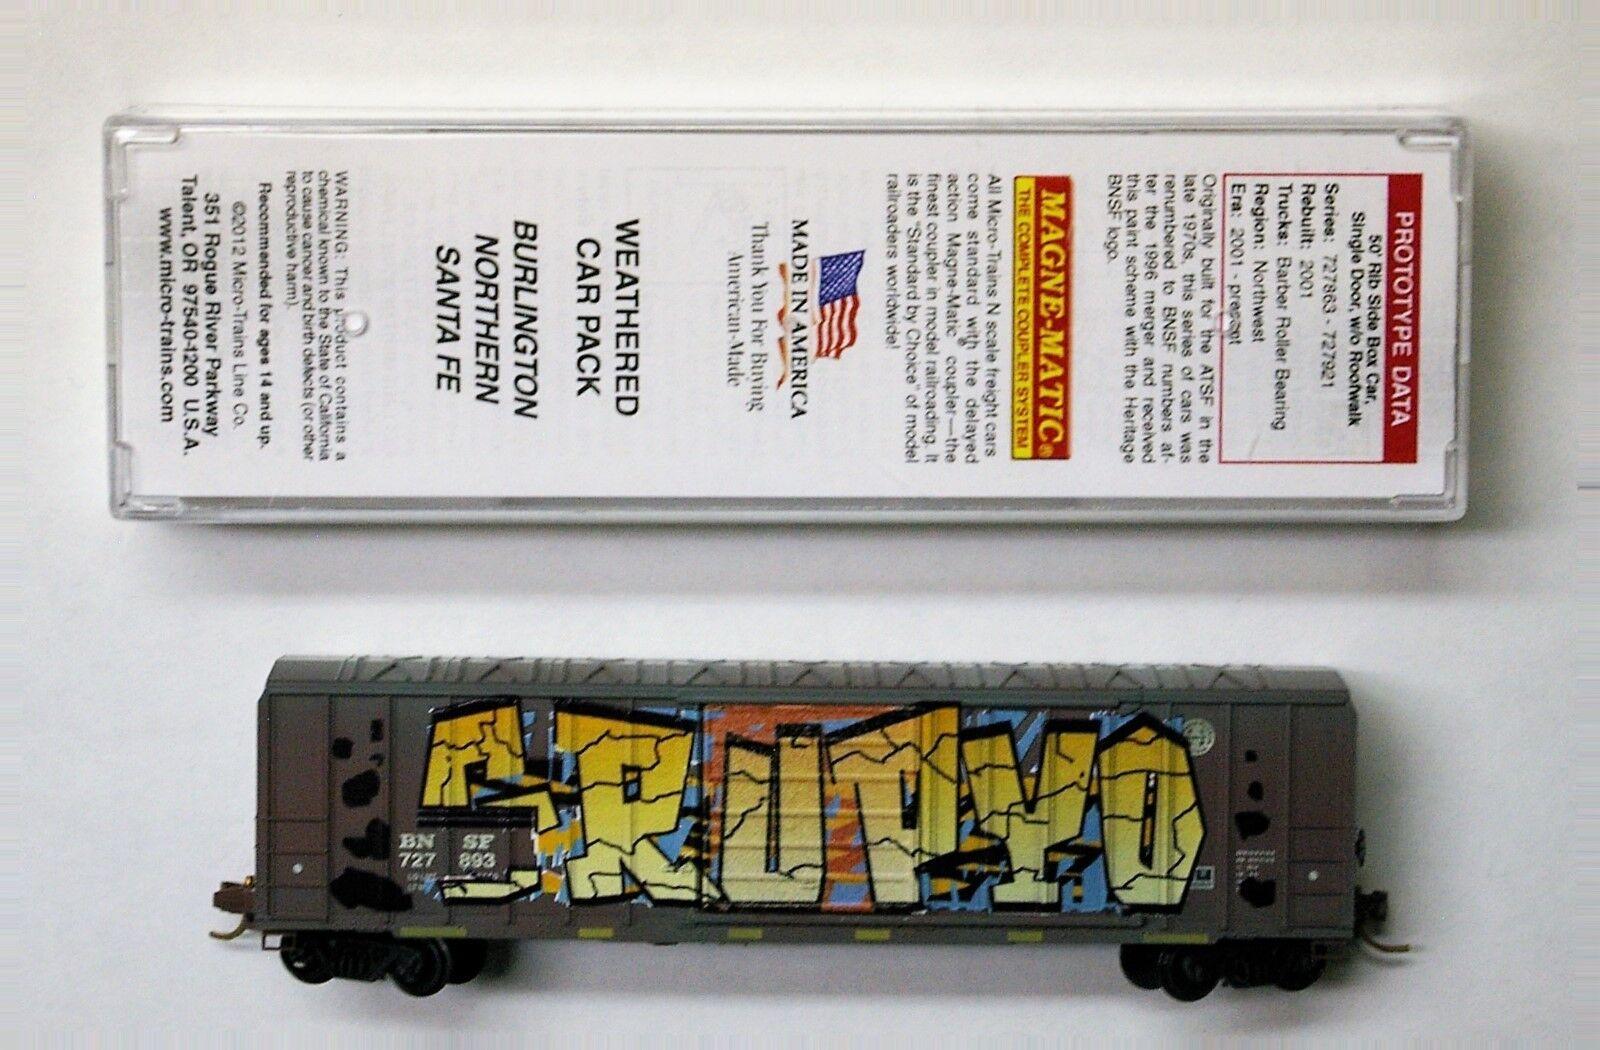 il miglior servizio post-vendita MTL Micro-i treni 25740 BNSF various various various  s FW  risparmia il 60% di sconto